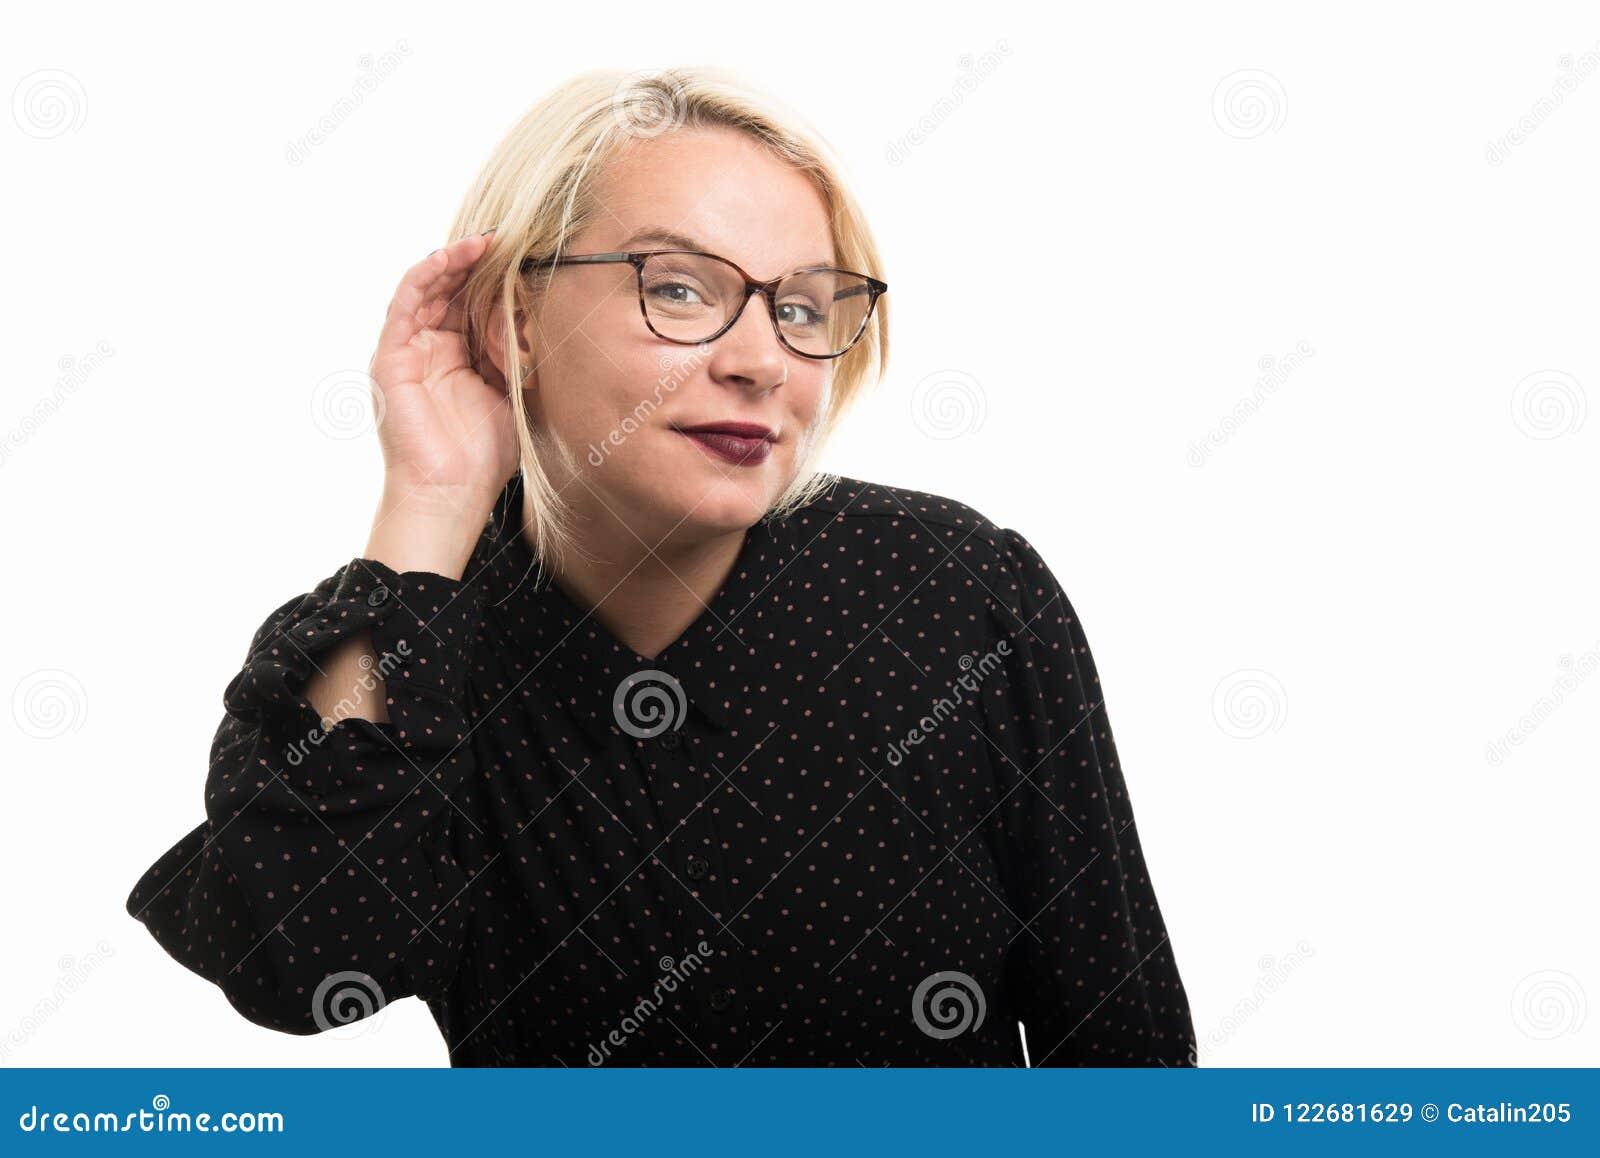 Blonde female teacher wearing glasses showing can`t hear gesture